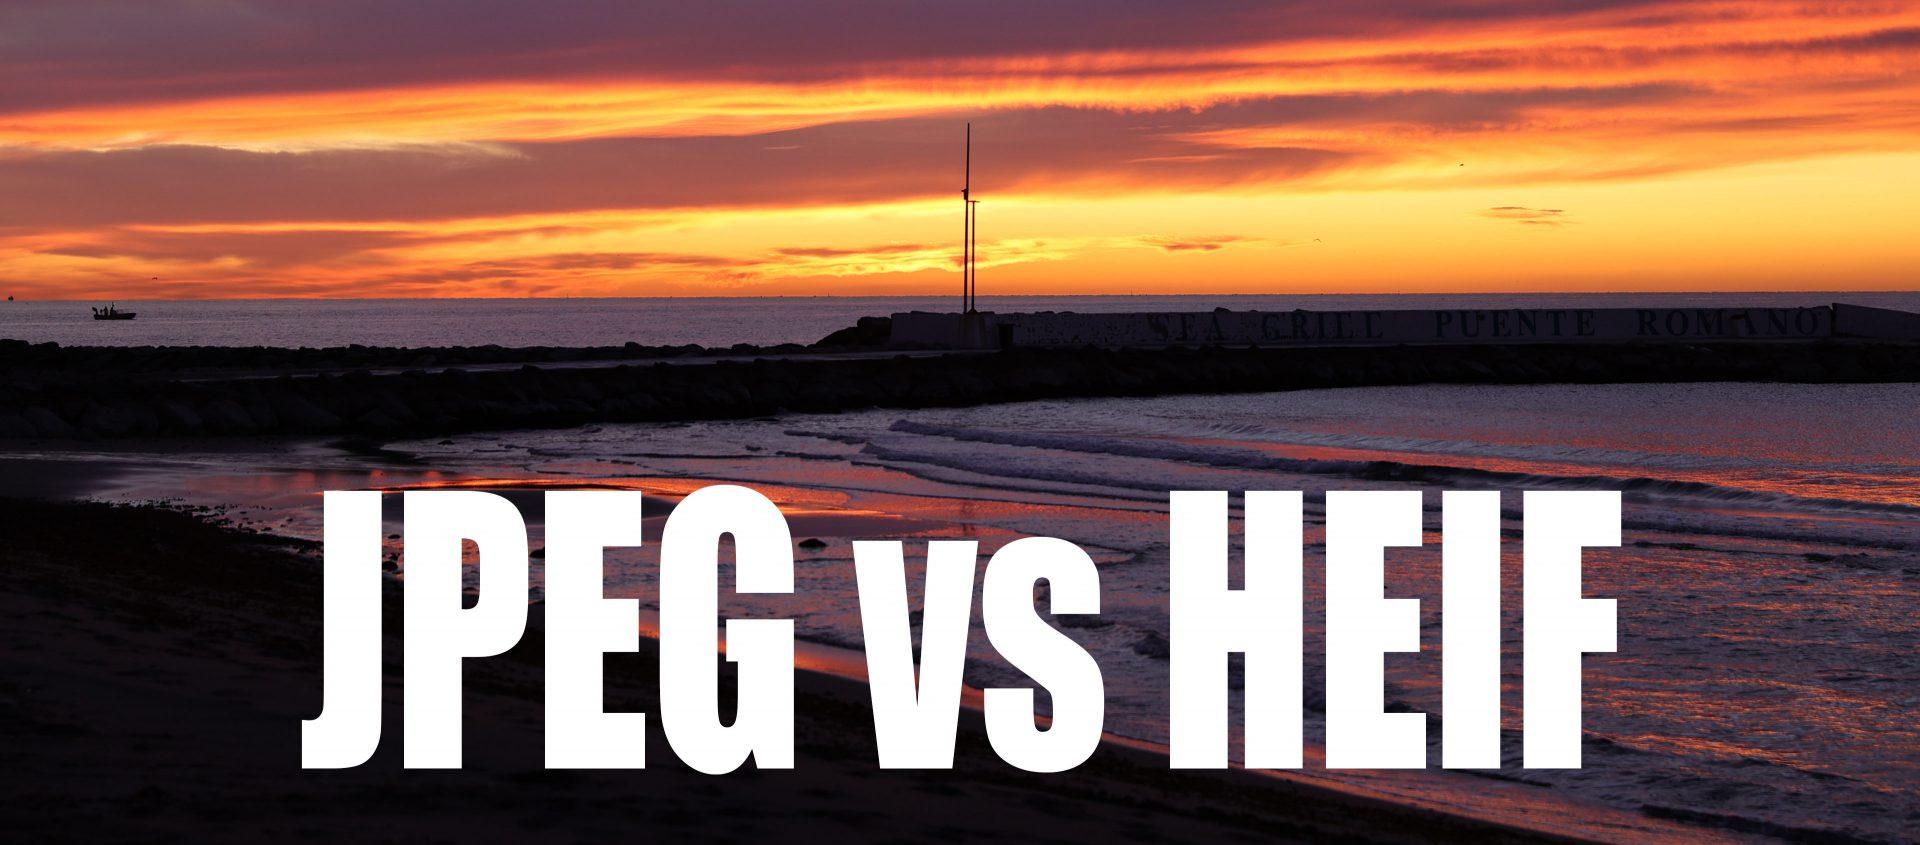 jpeg-vs-heif-header